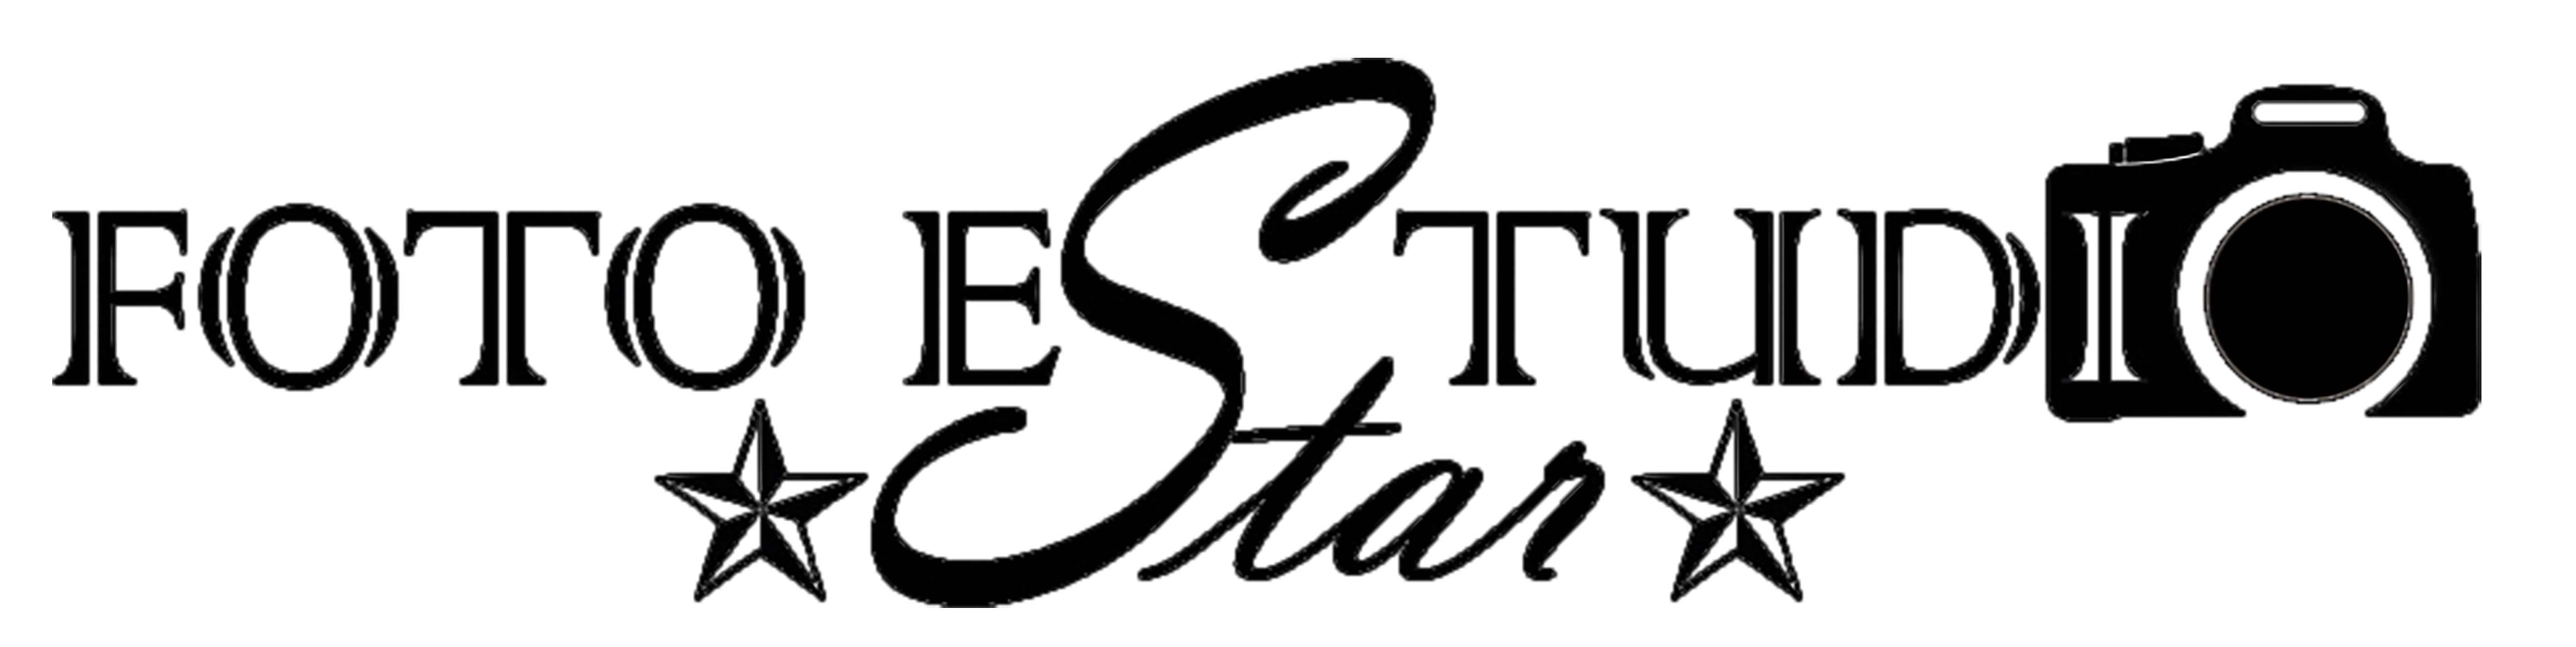 FOTO ESTUDIO STAR